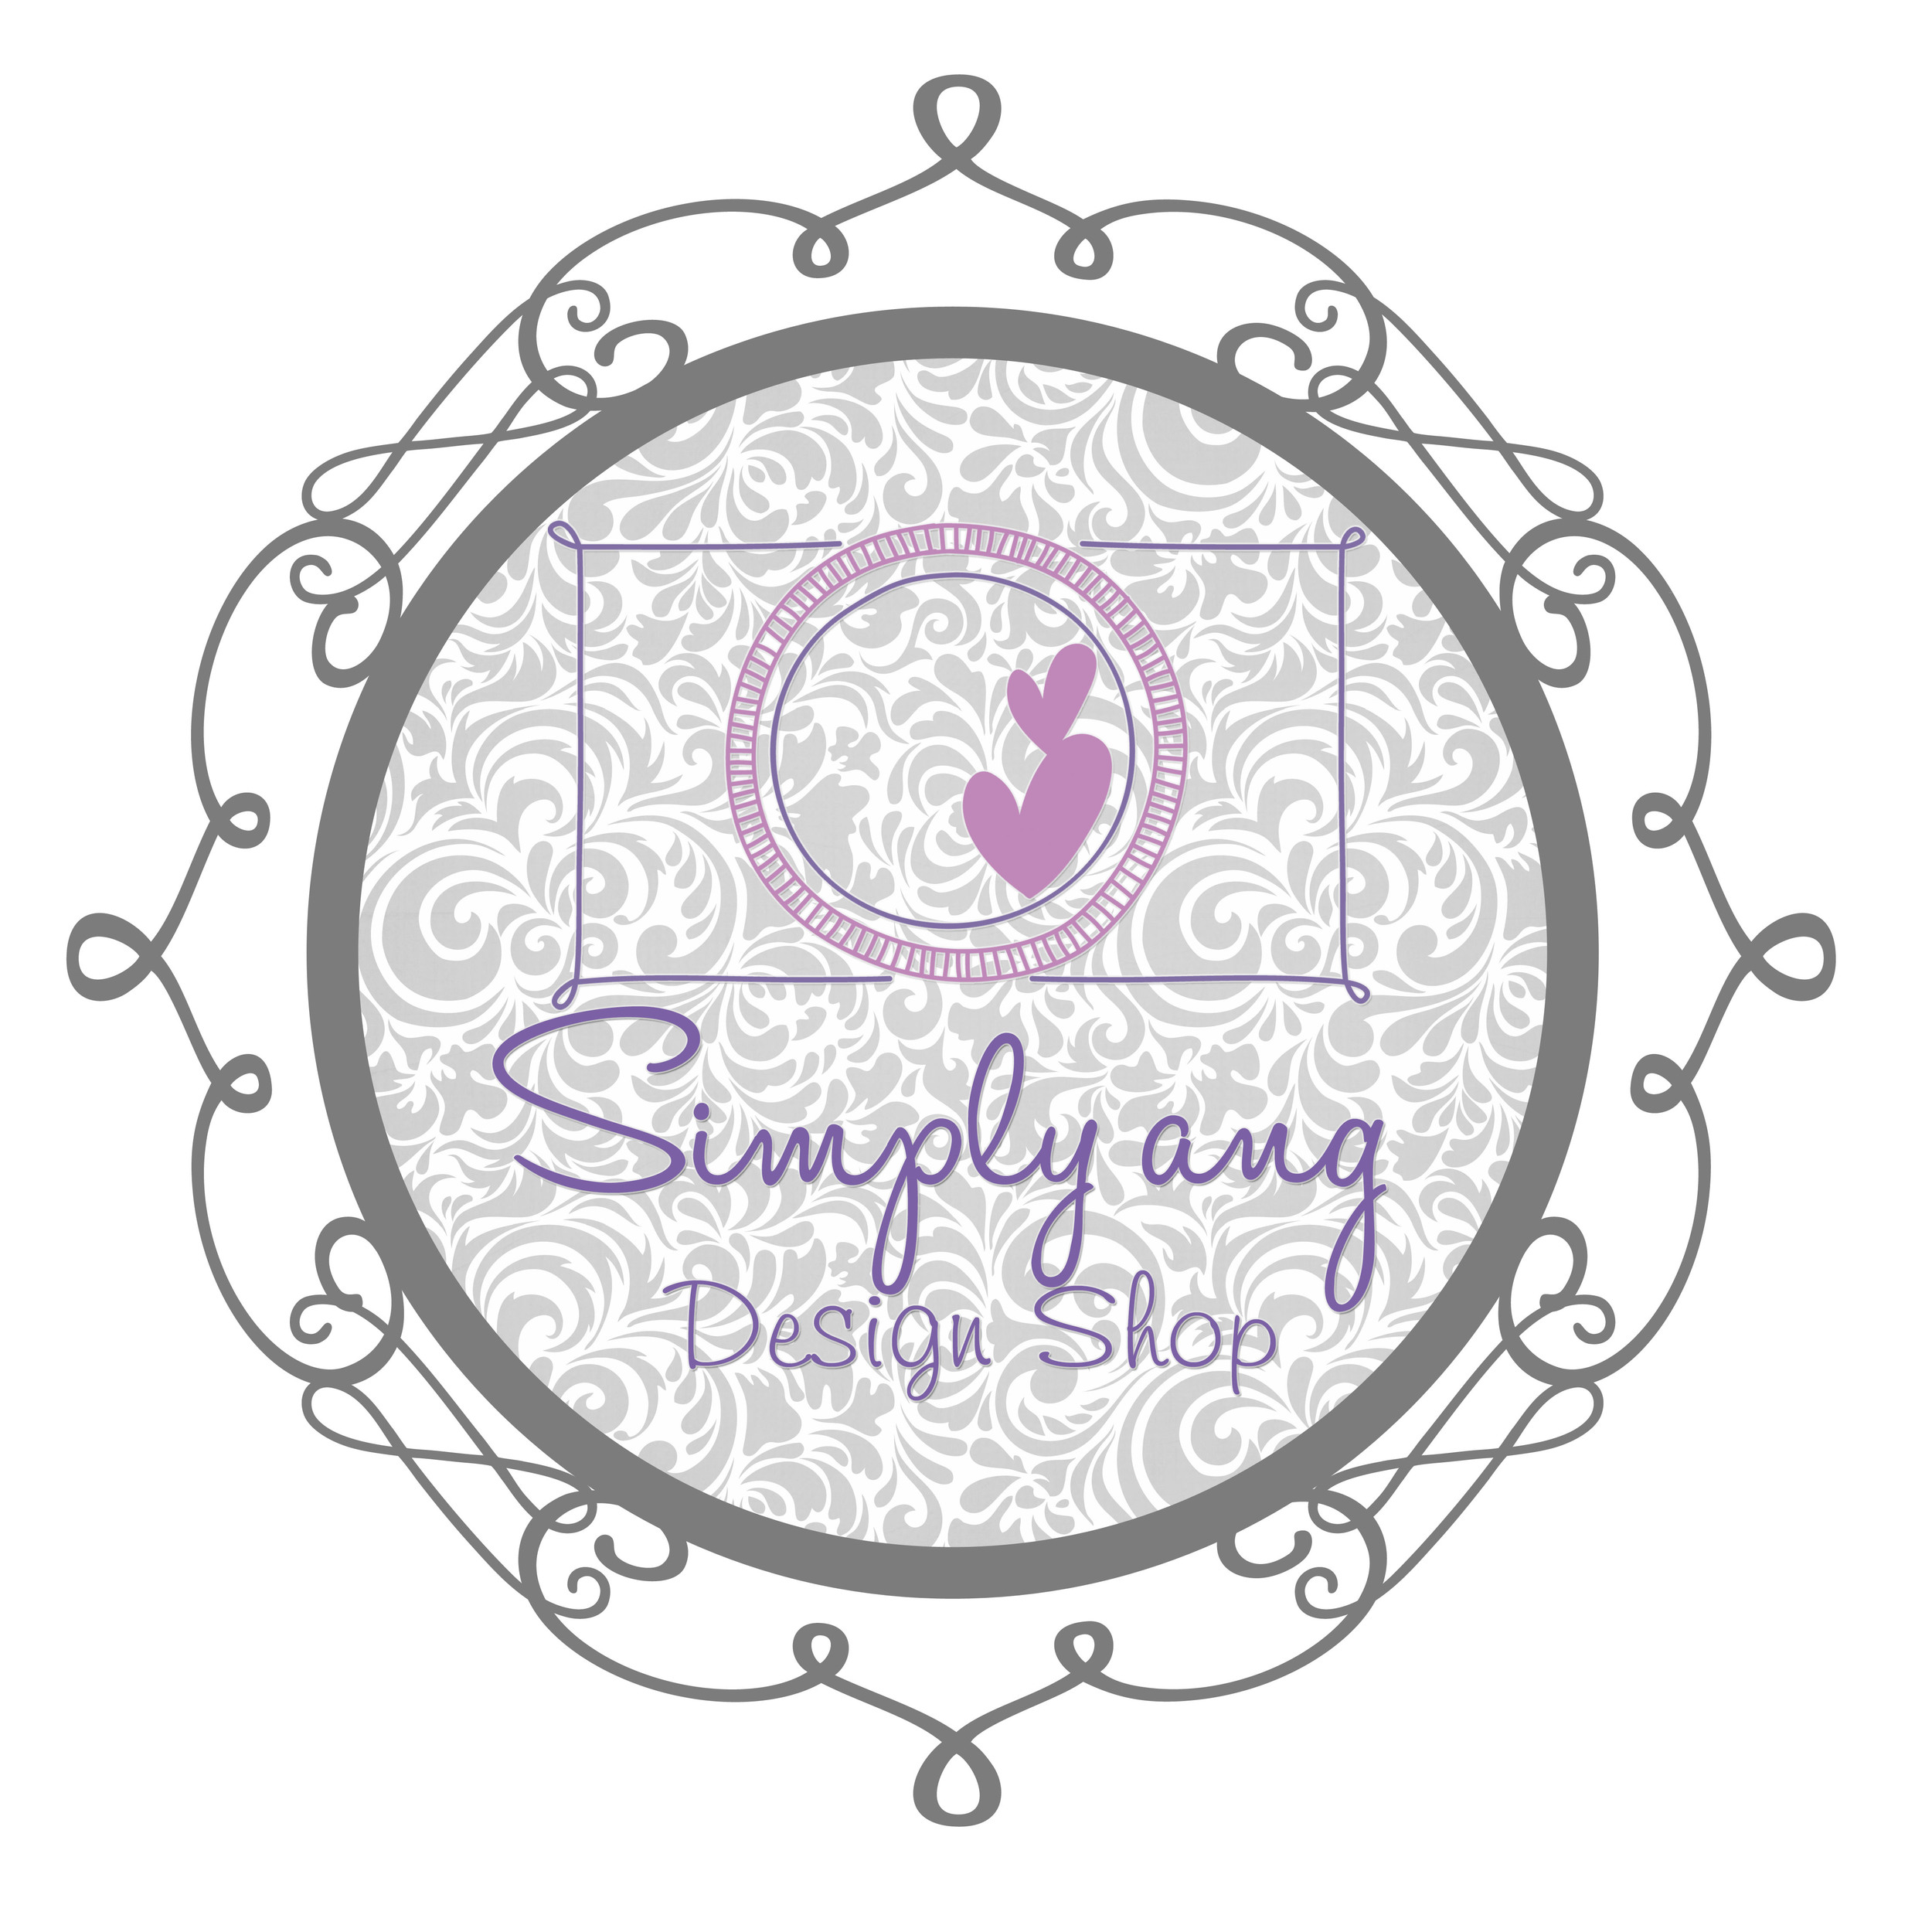 photography logo8.jpg